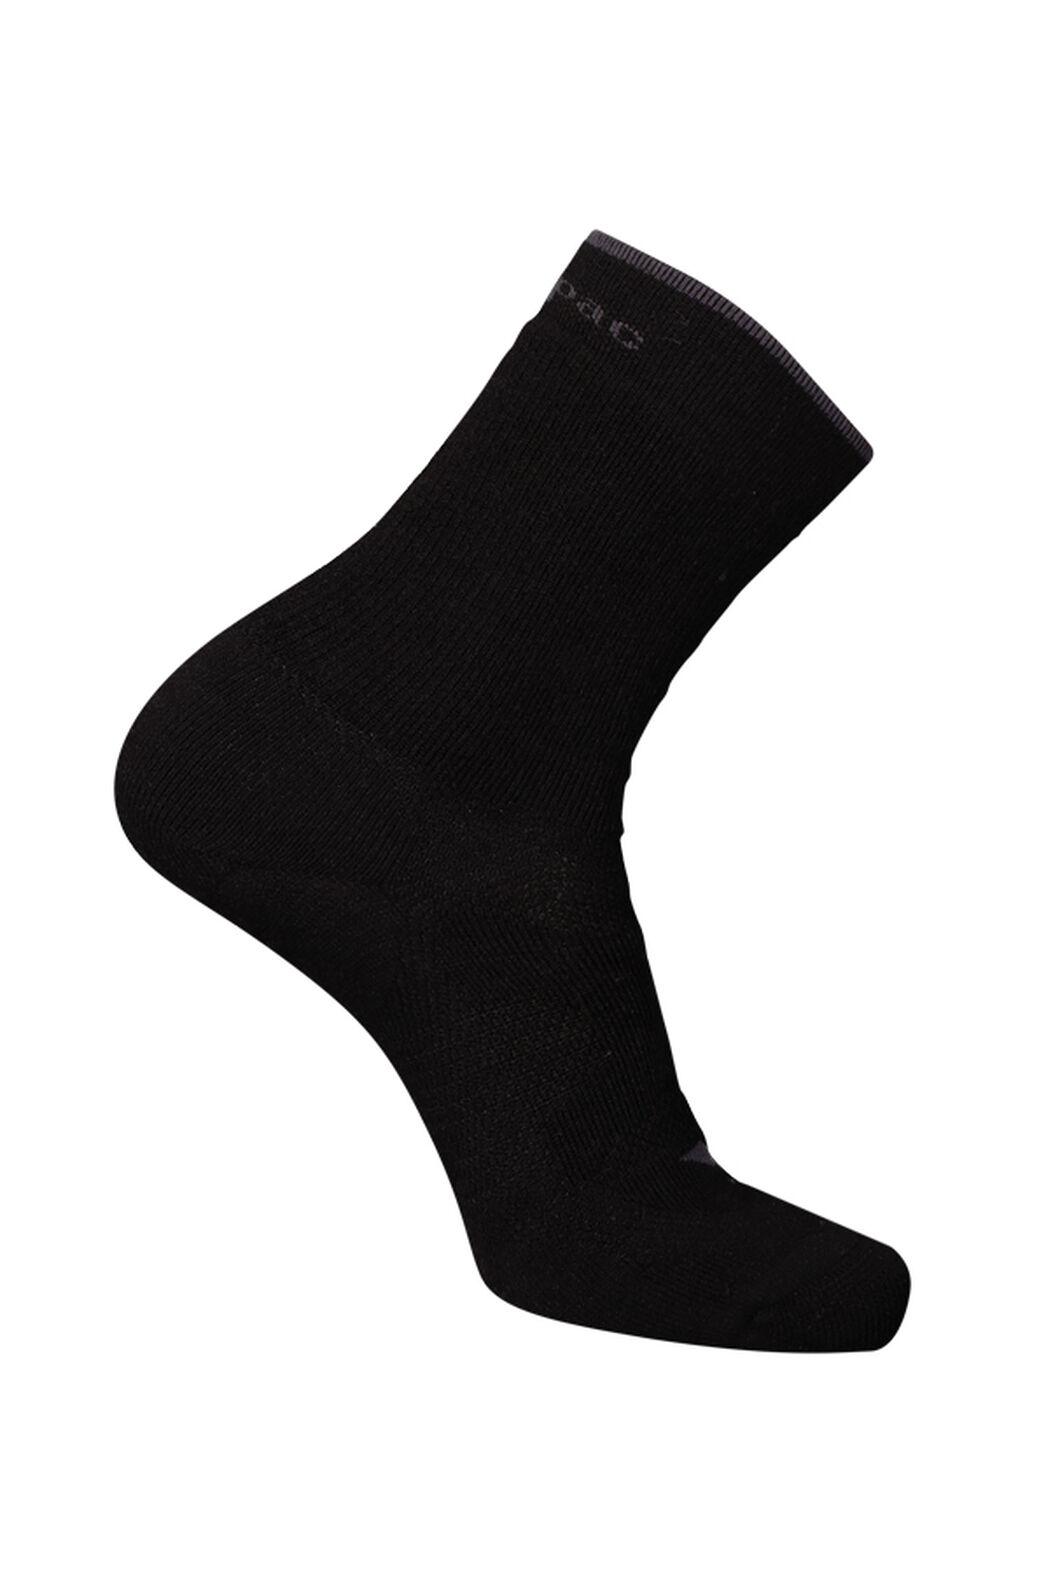 Macpac Merino Hiking Sock, Black, hi-res